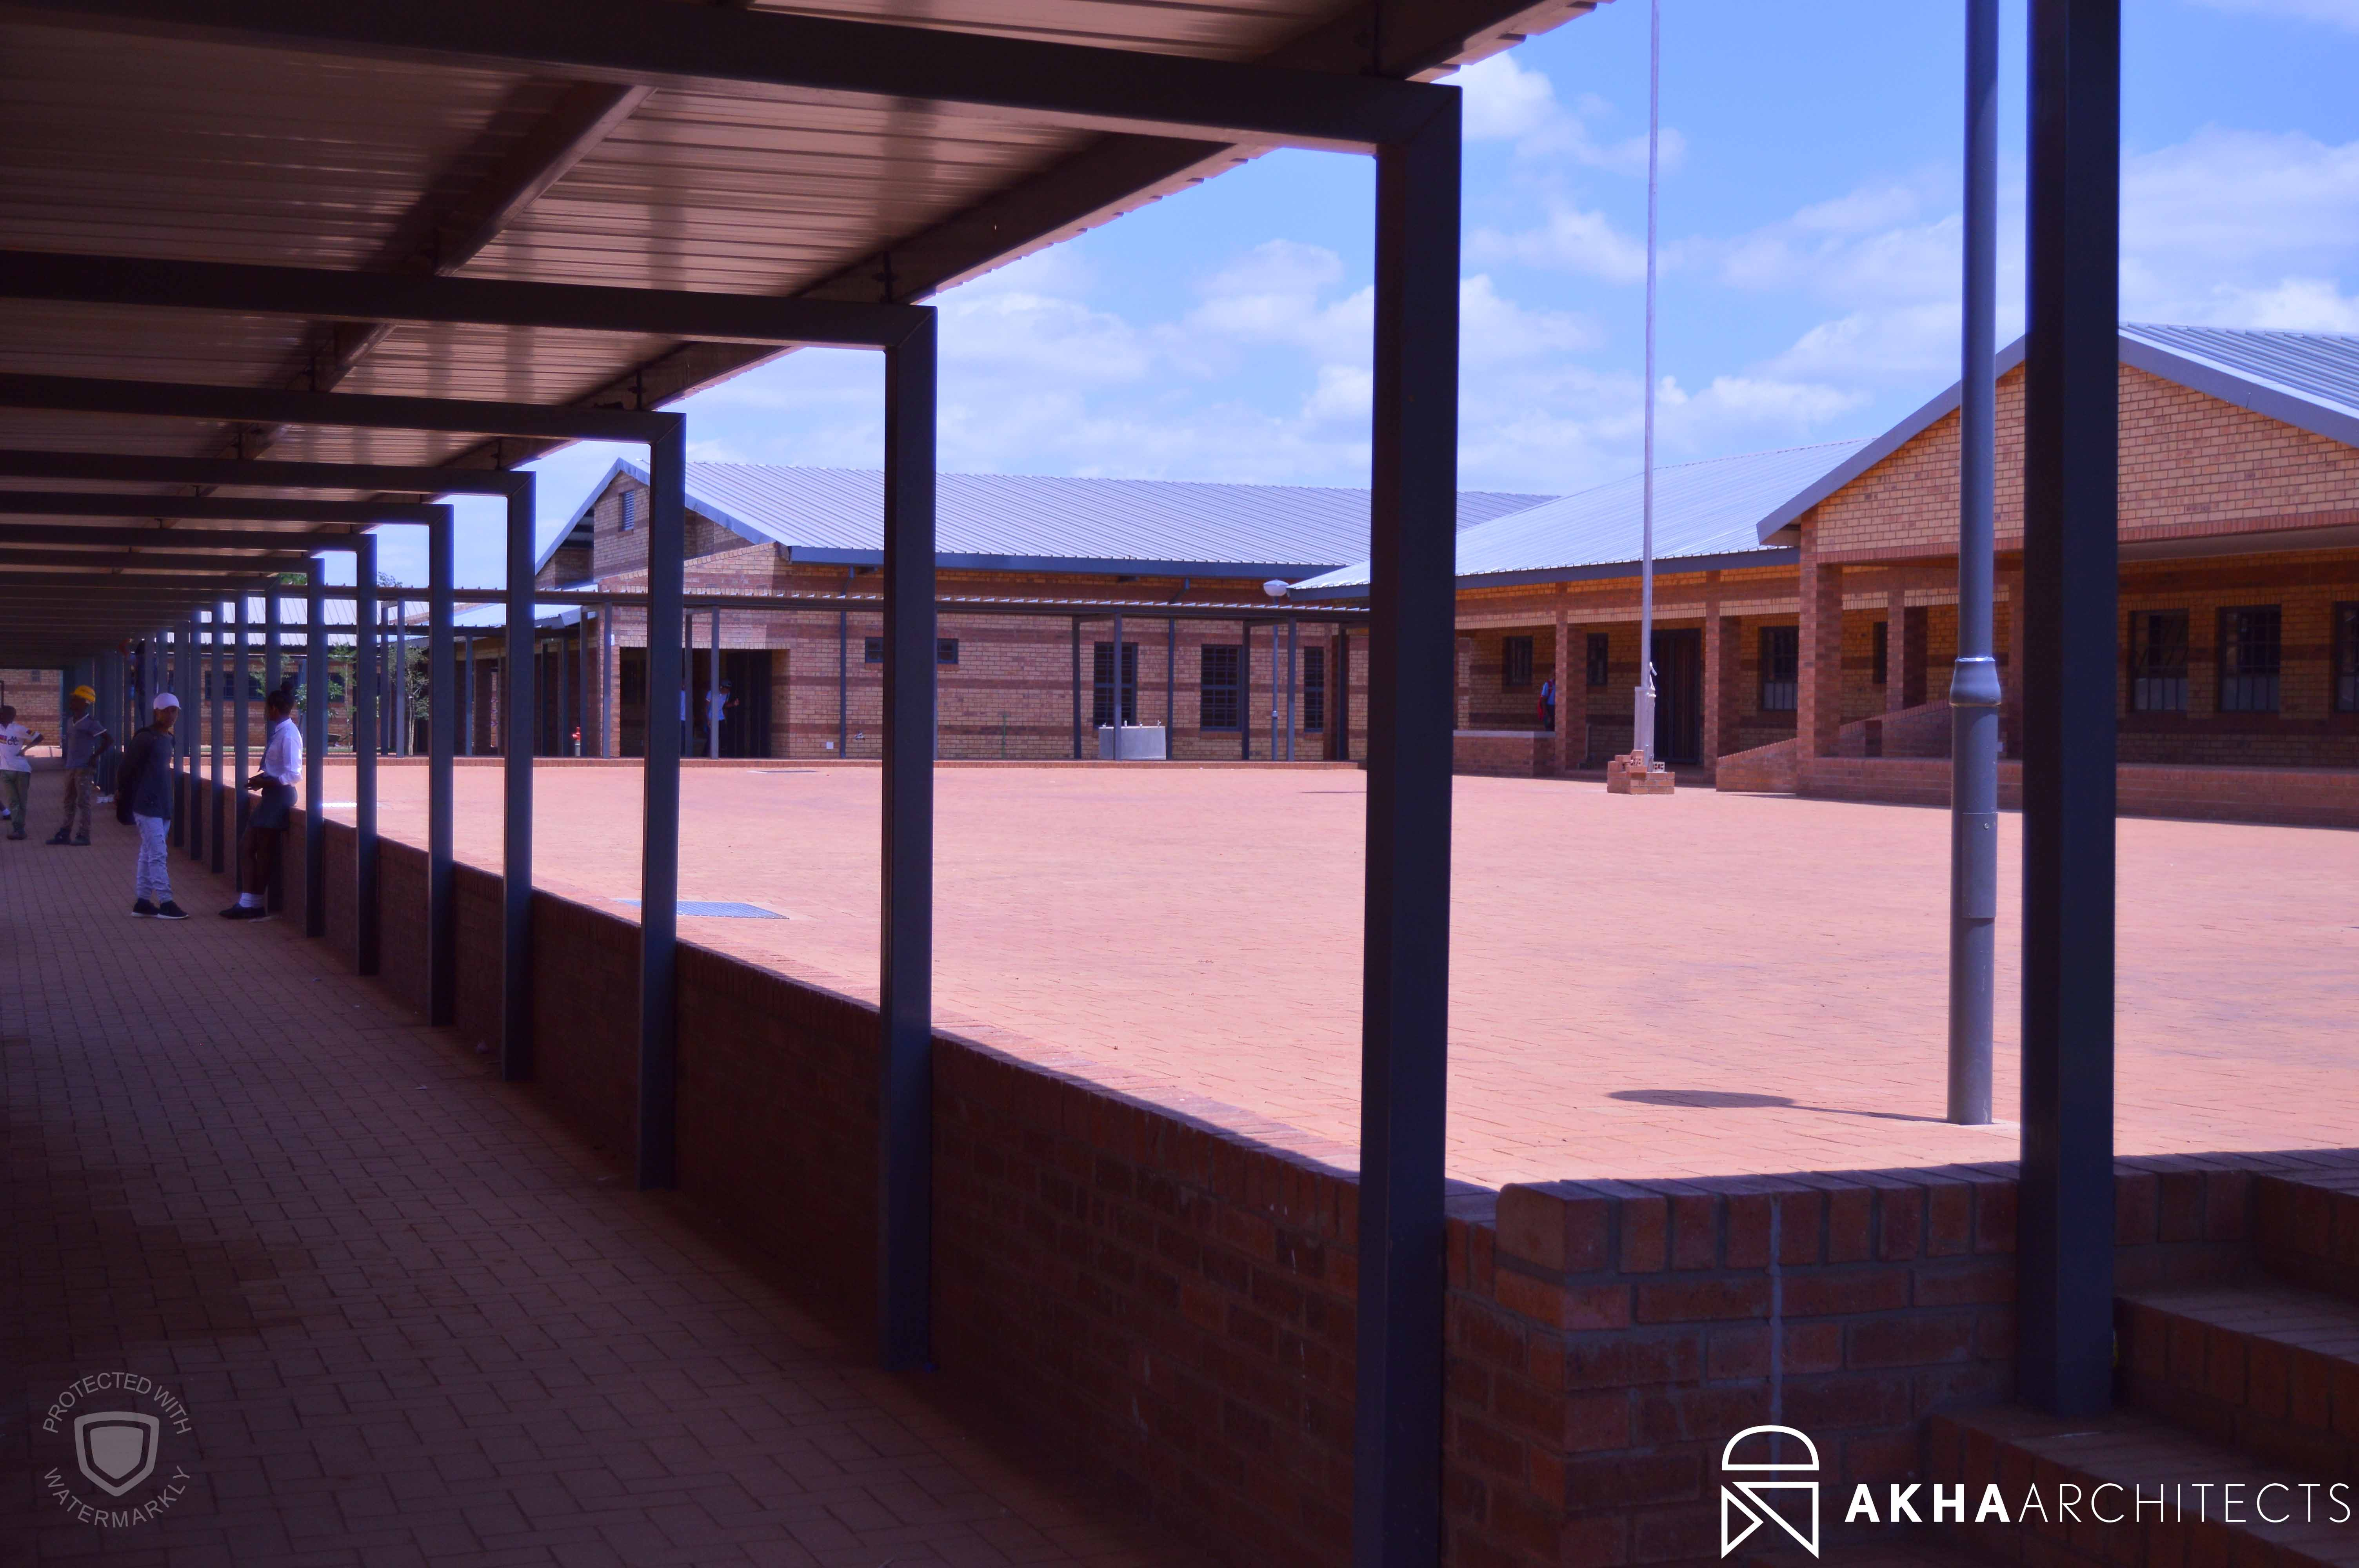 SOSHANGUVE EAST SECONDARY SCHOOL